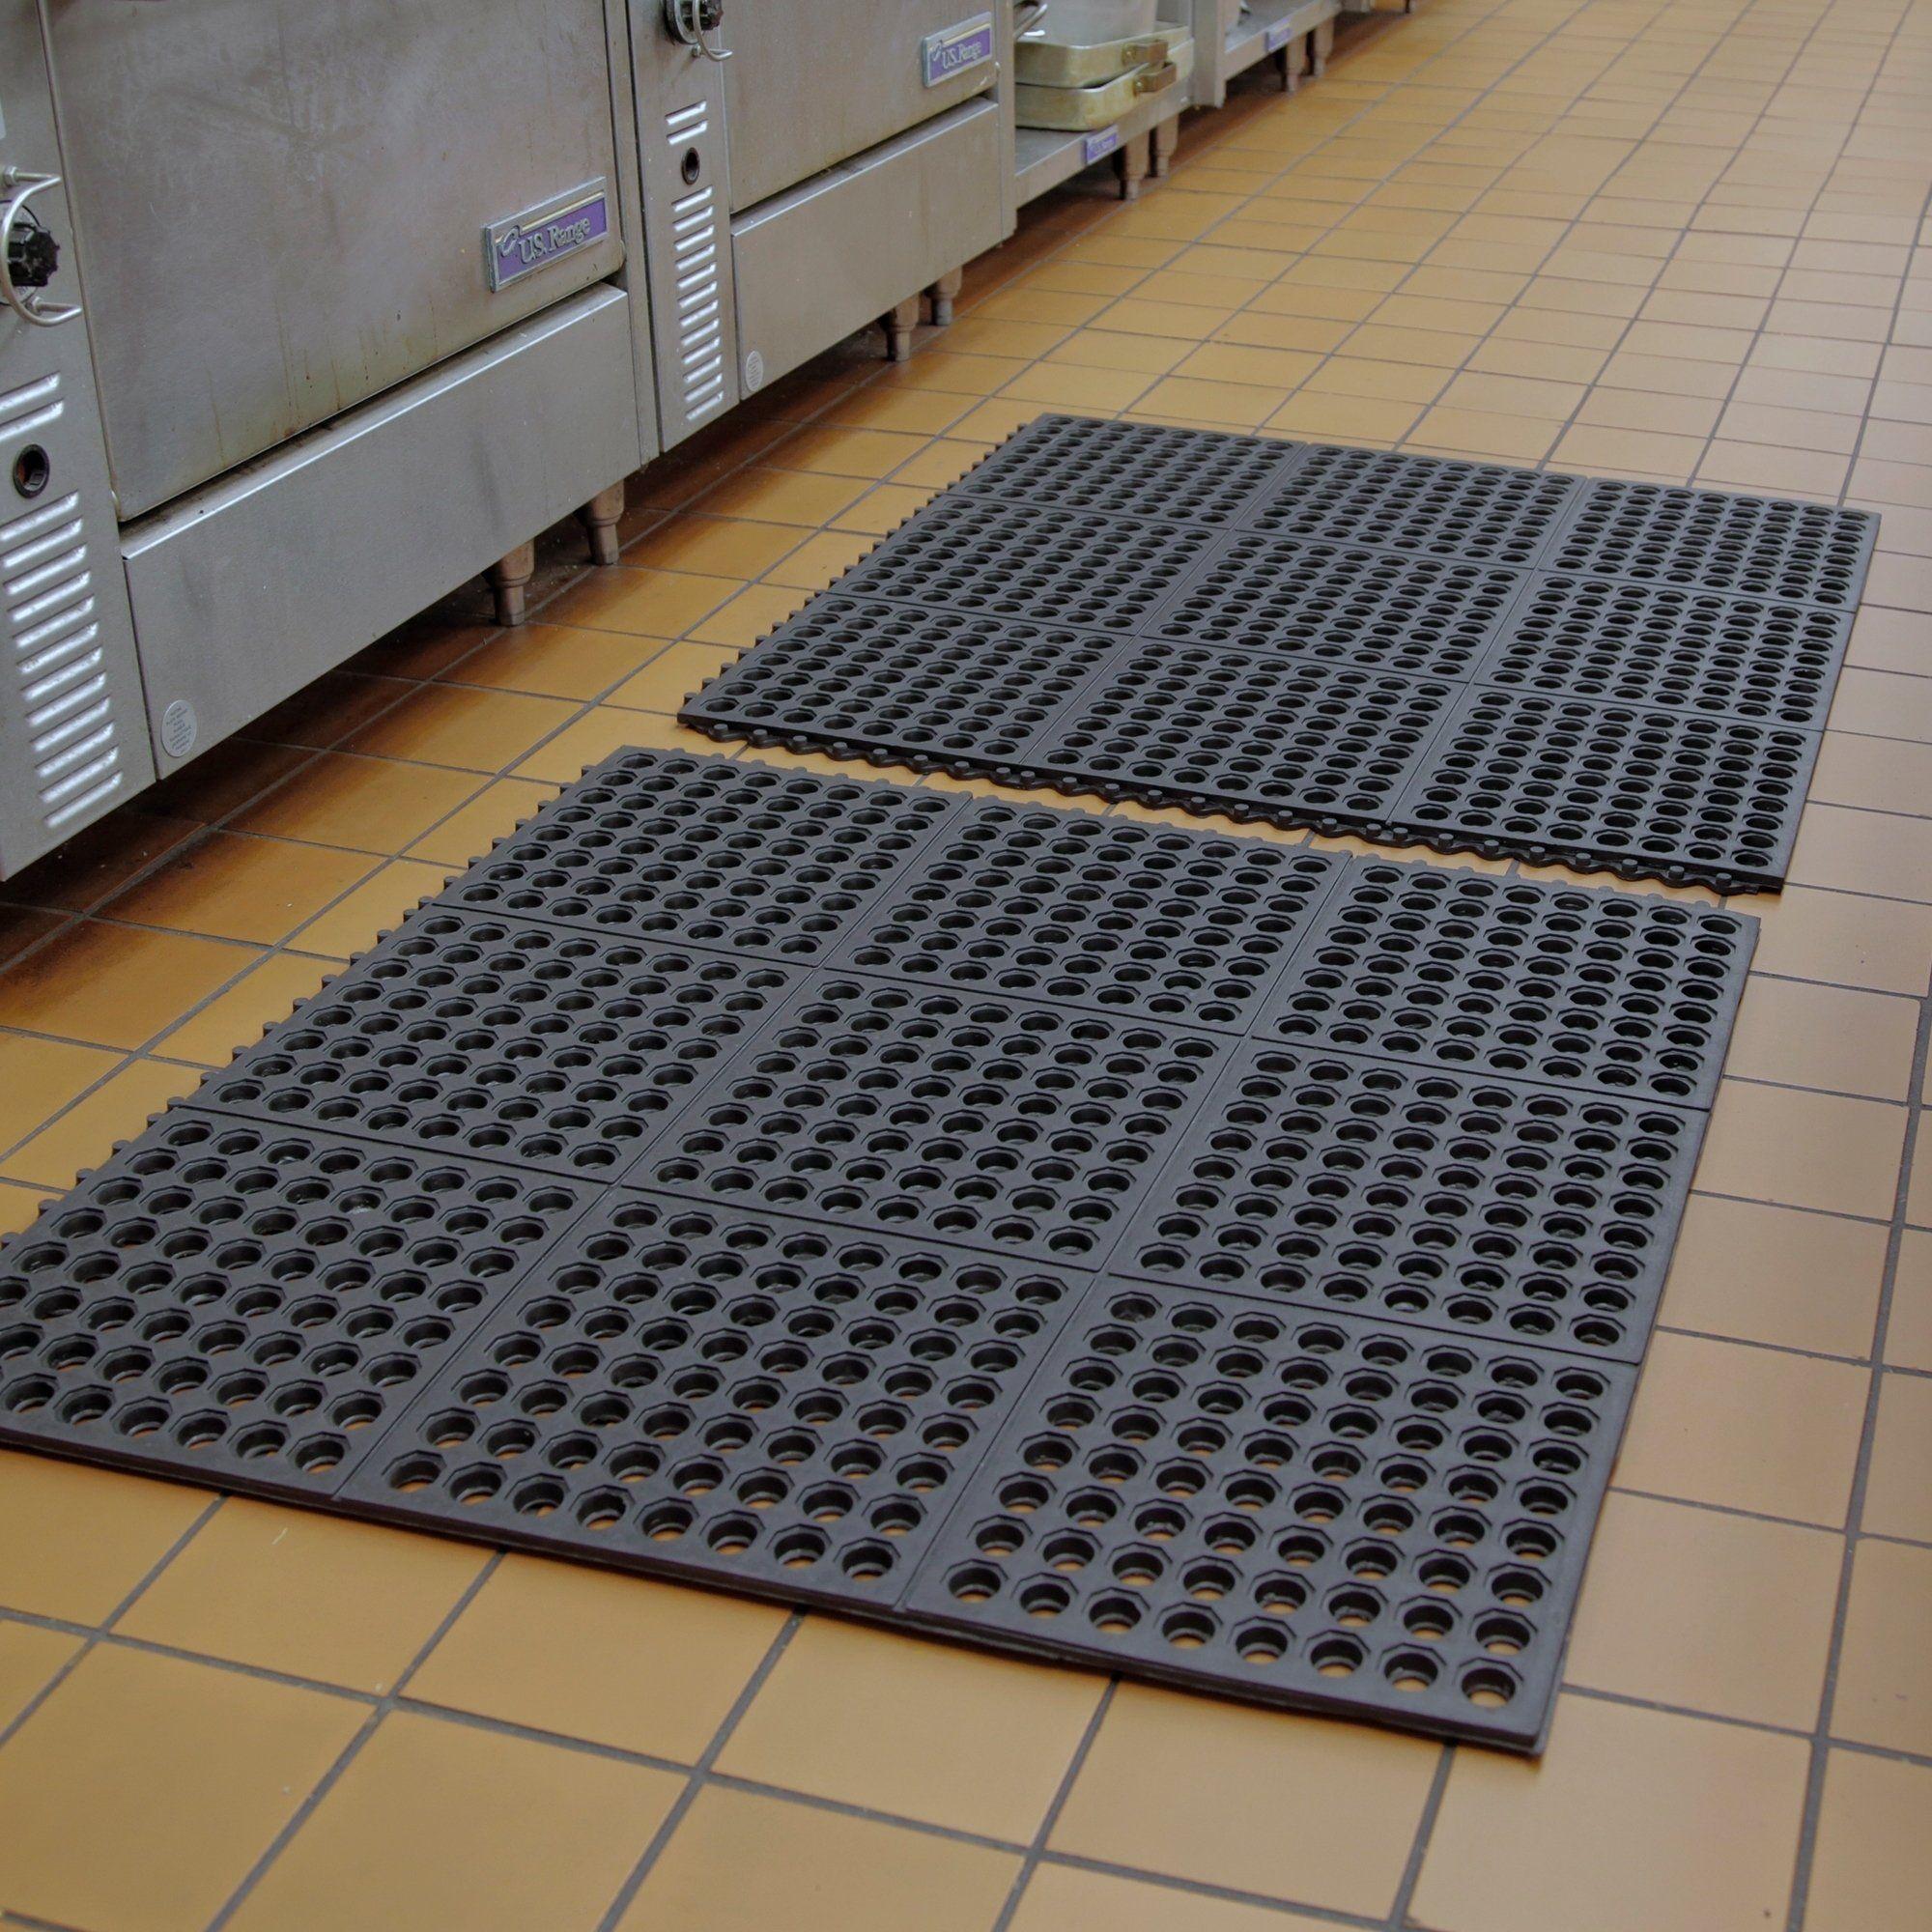 Mats Inc. Cushion Safe Kitchen Mat, Black (Black - 3\' x 3 ...